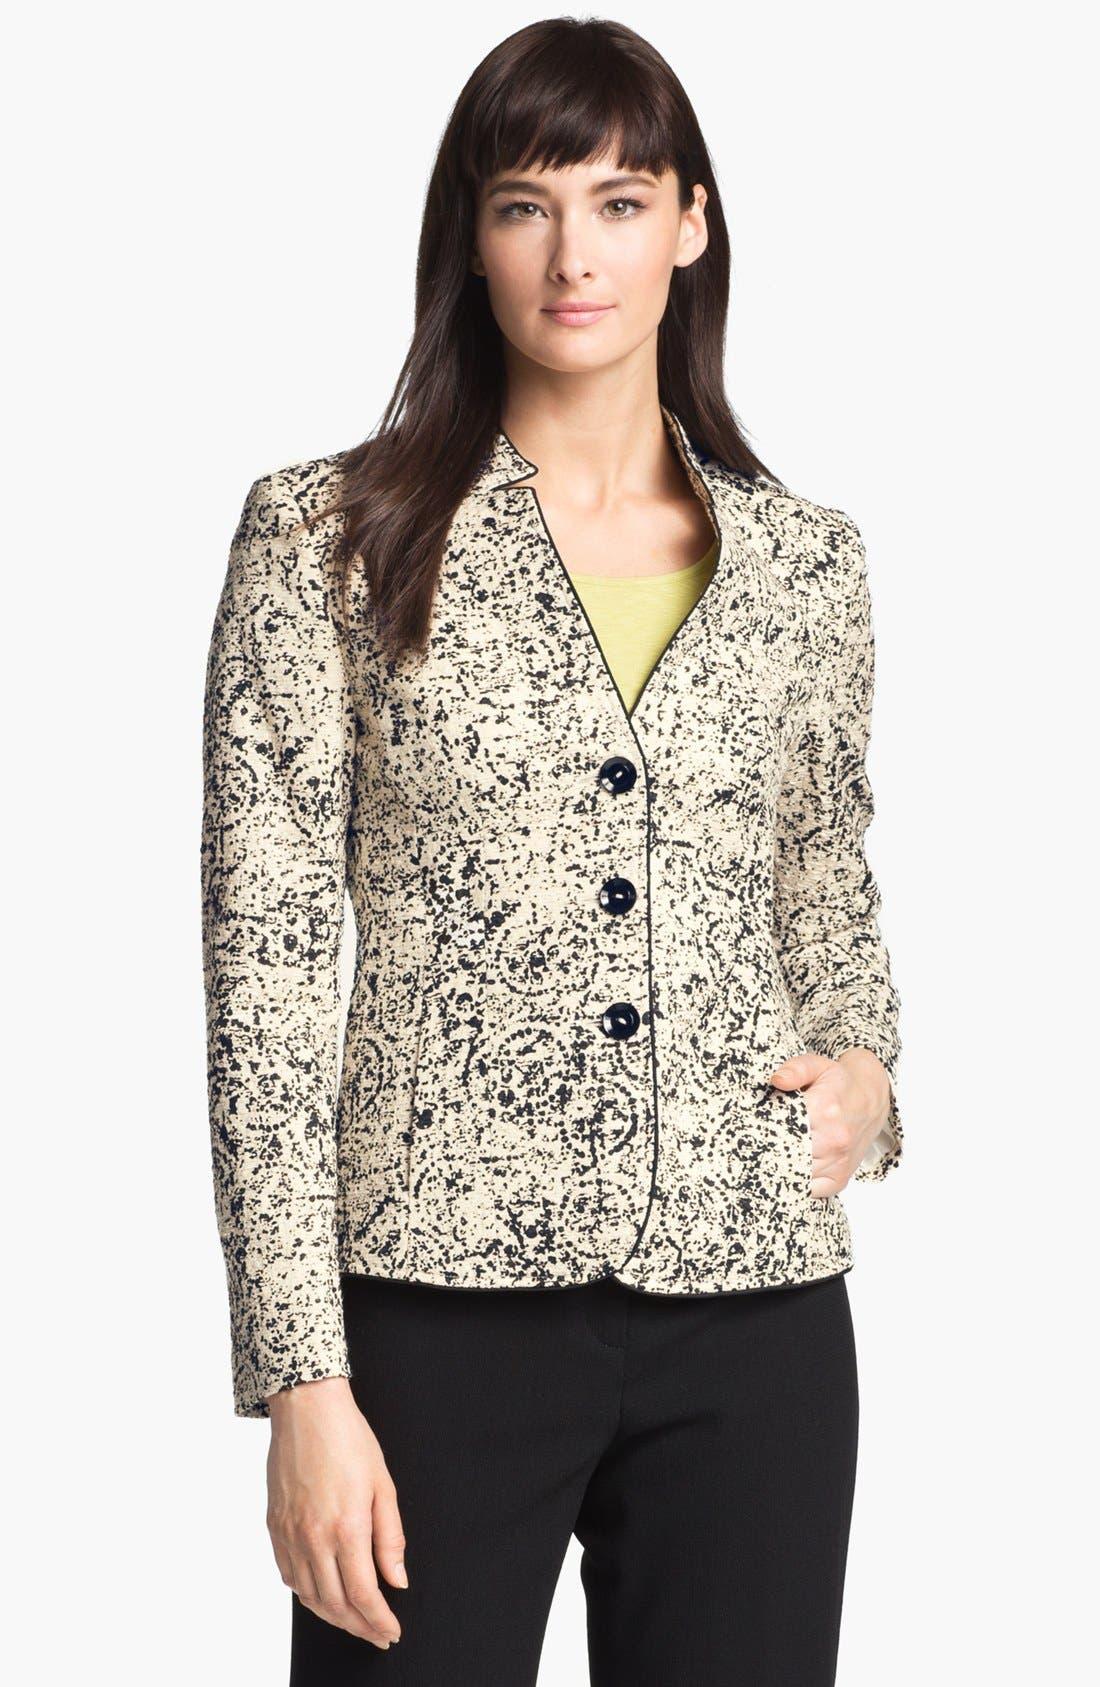 Alternate Image 1 Selected - Santorelli 'Adelina' Jacket